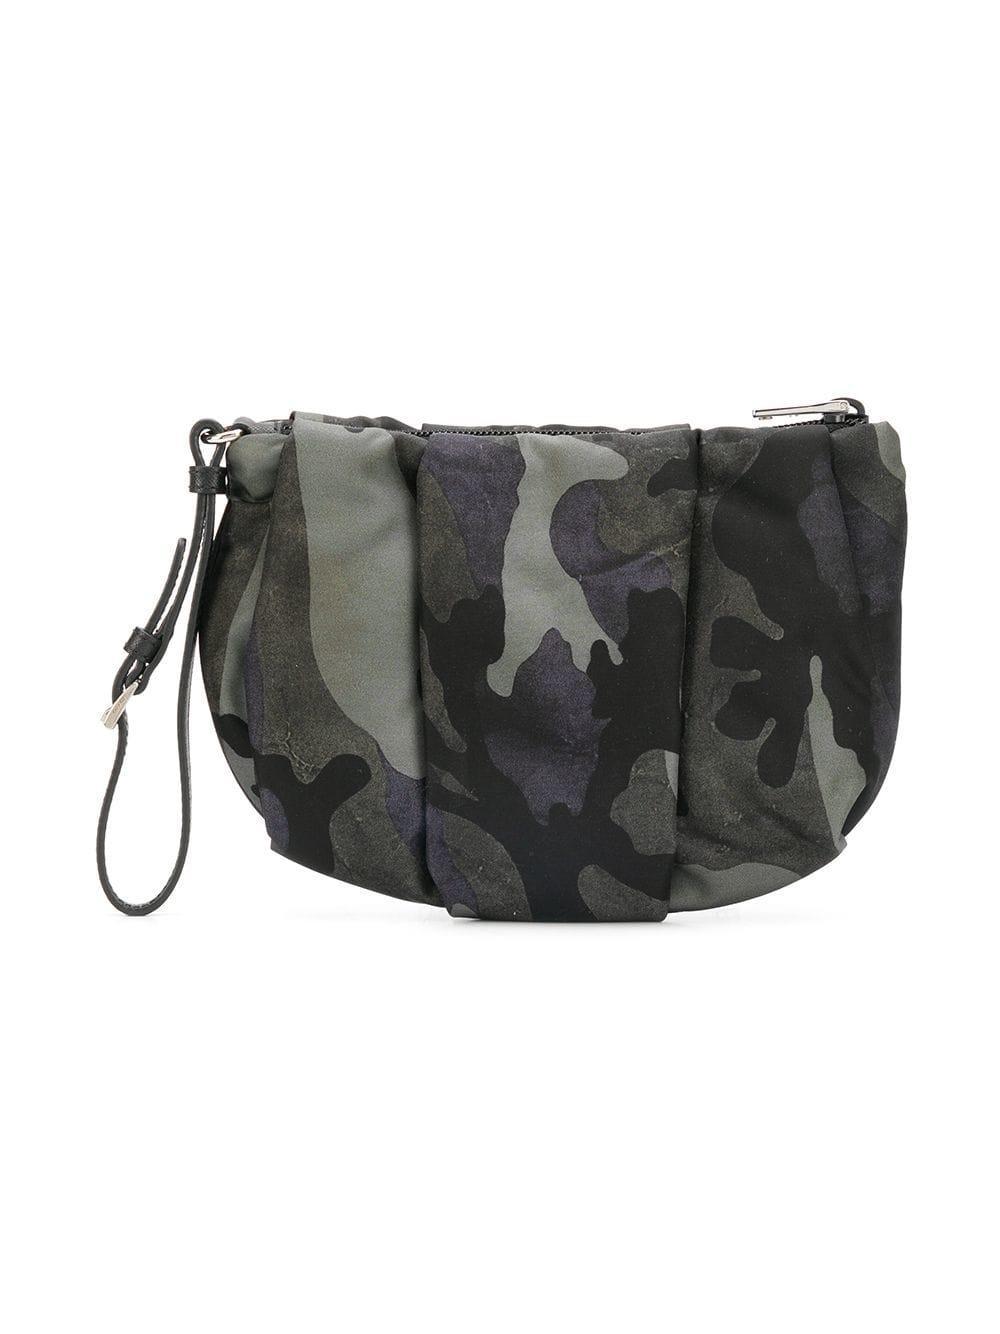 0e346ab33253 ... low price prada black nylon camo make up bag lyst. view fullscreen  a2dc9 cd14c